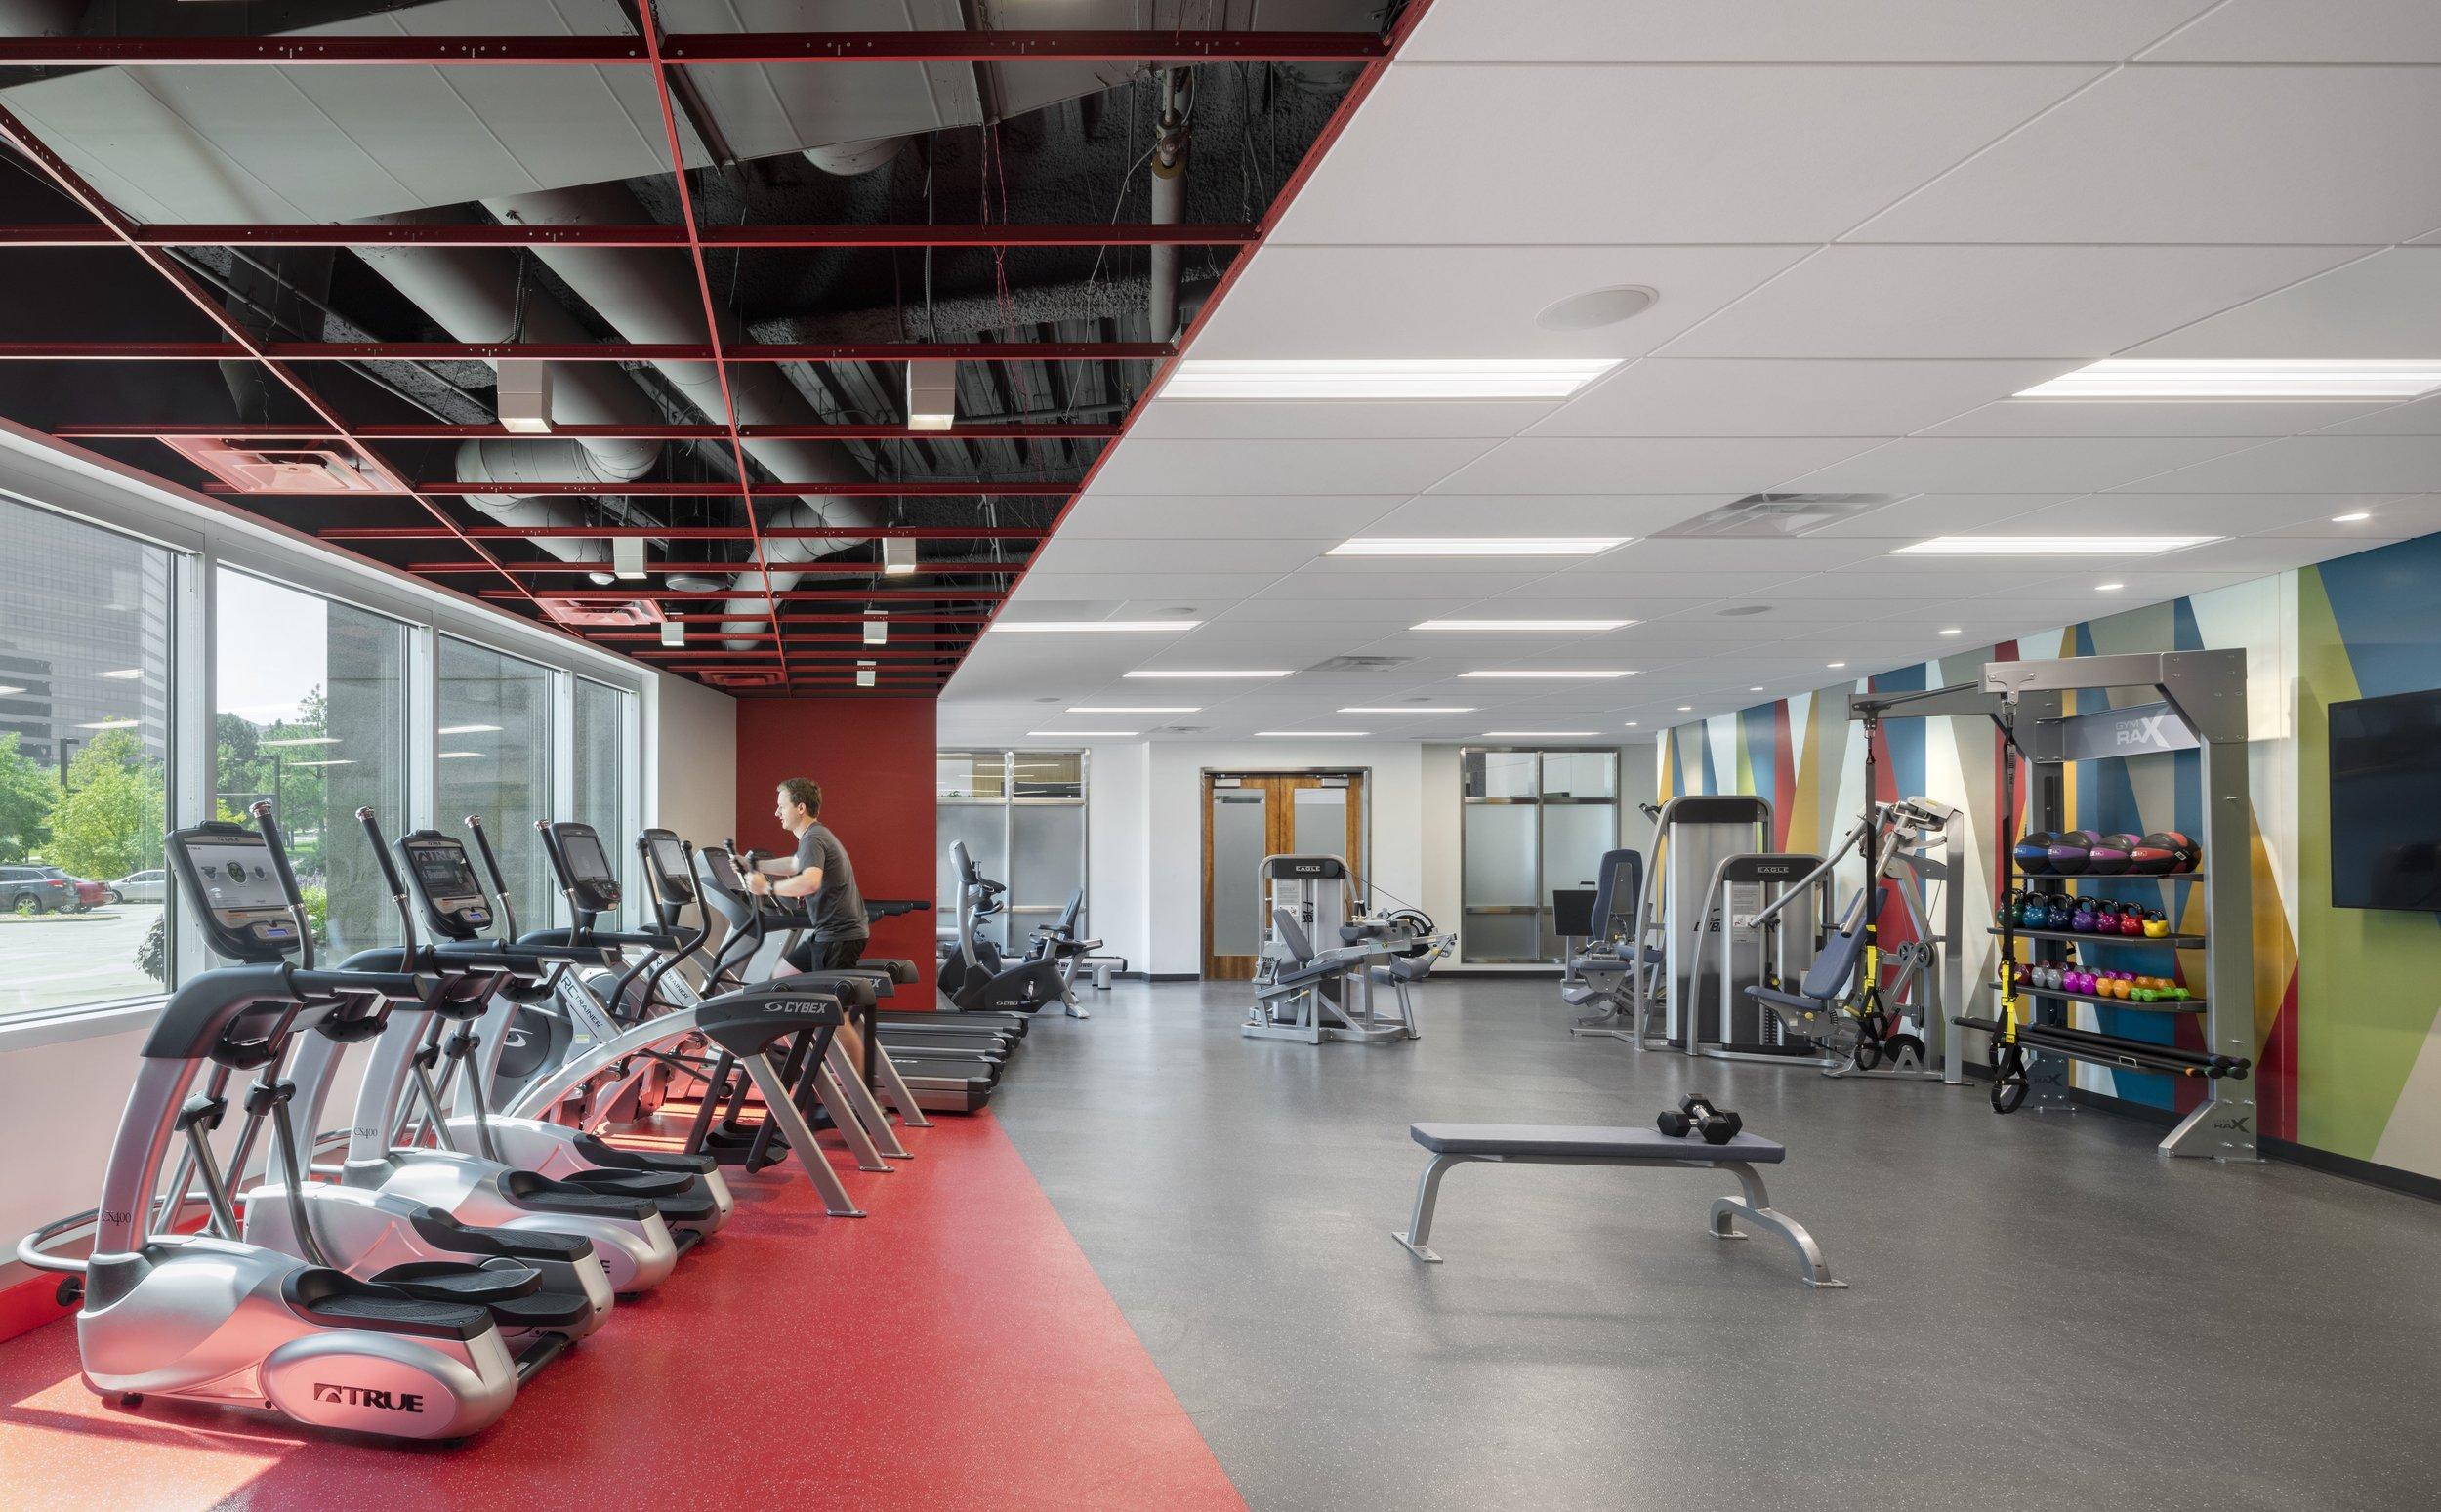 Interior_Gym.jpg